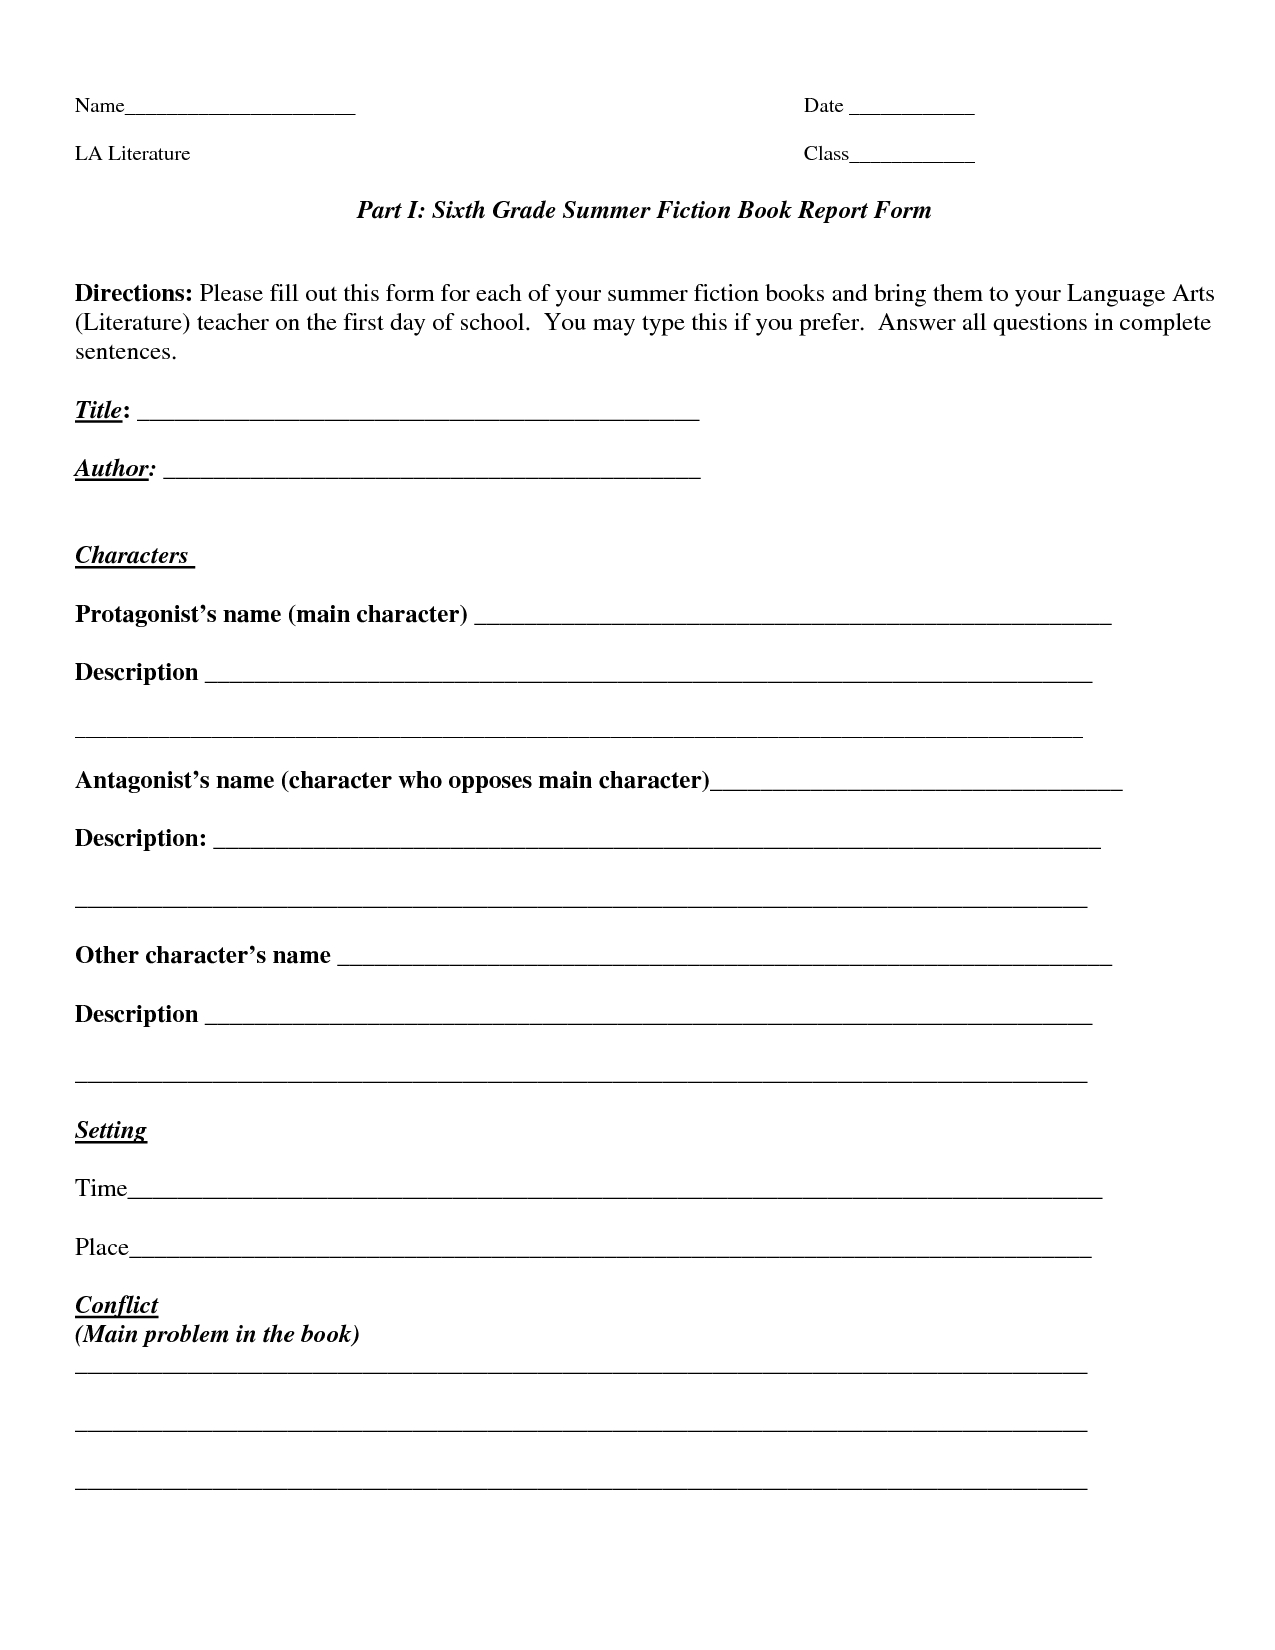 Book Report Template | Part I Sixth Grade Summer Fiction intended for 6Th Grade Book Report Template